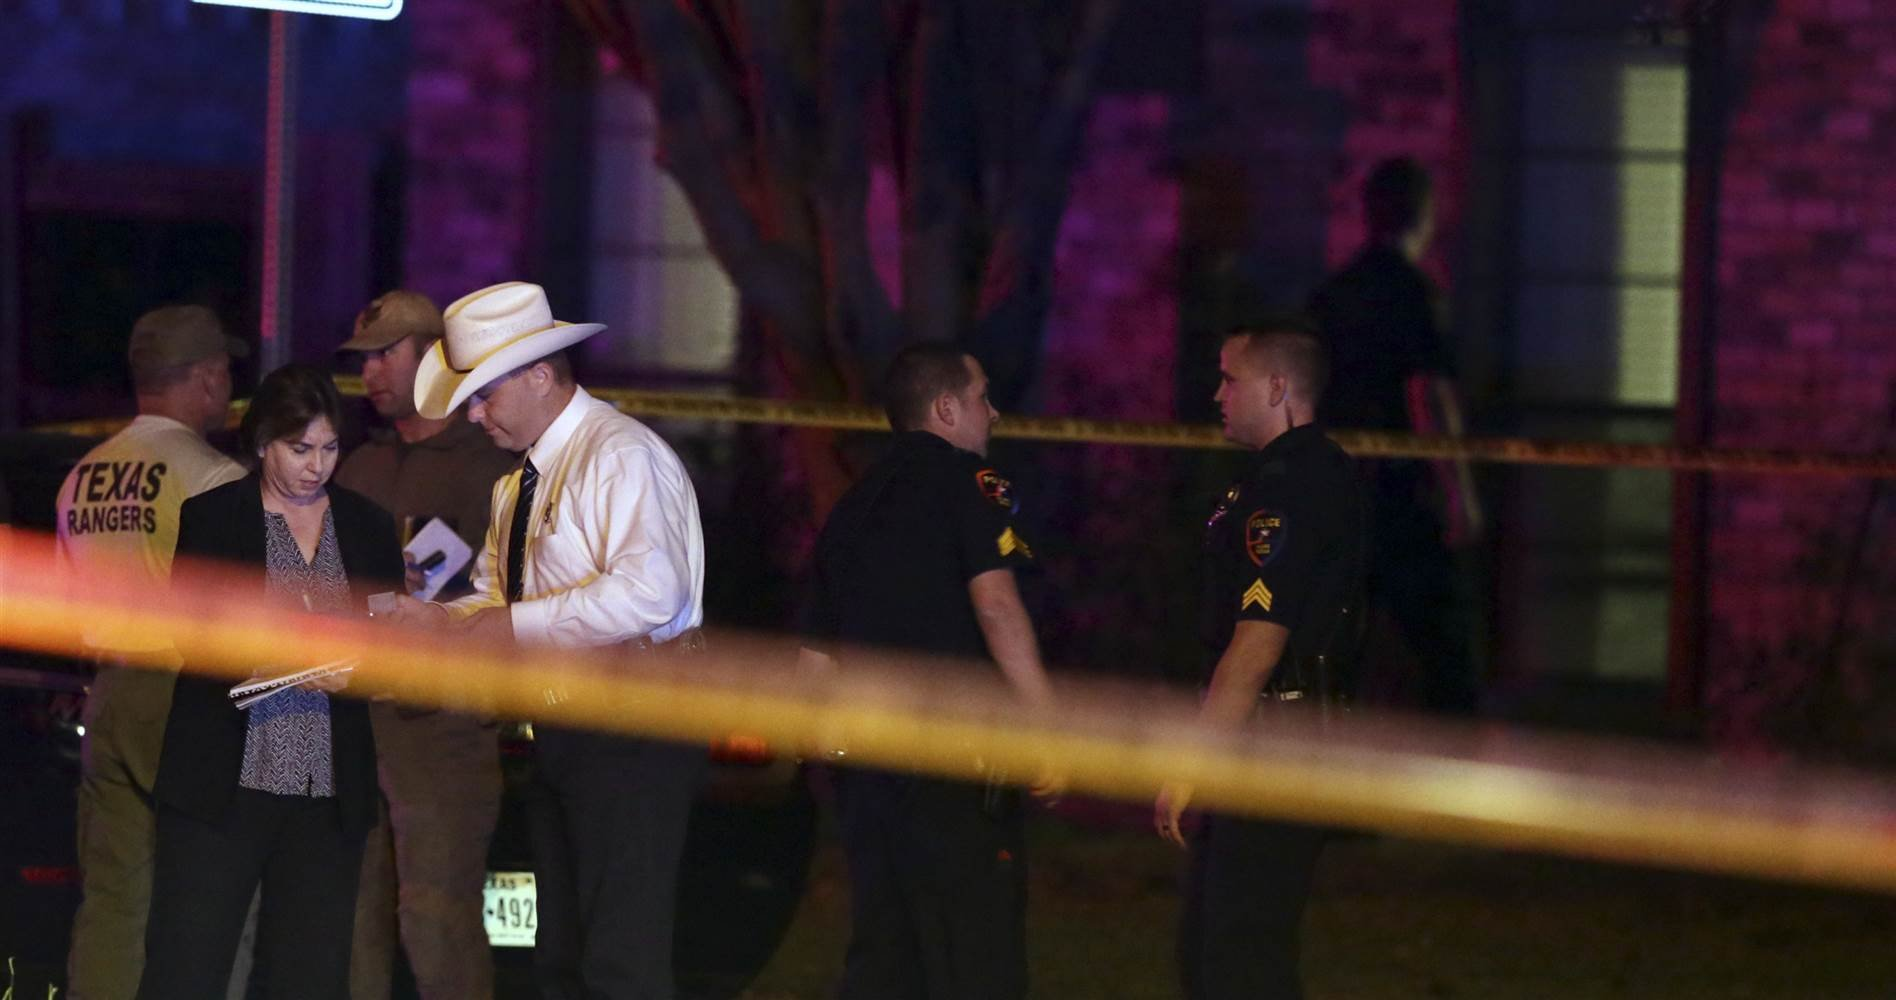 https://www.nbcnews.com/news/us-news/plano-texas-shooting-leaves-8-dead-including-suspect-n800221